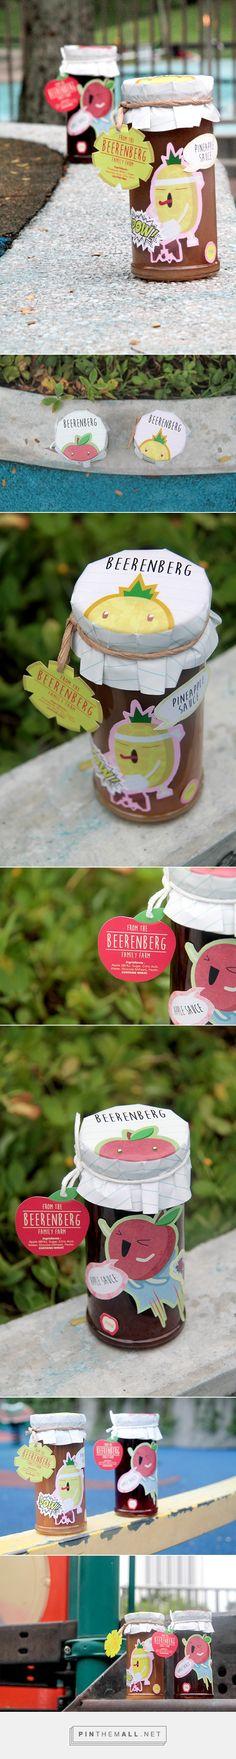 Beerenberg Family Farm Jam Label Design by Wilona Wirianta on Behance. Packaging smile : )